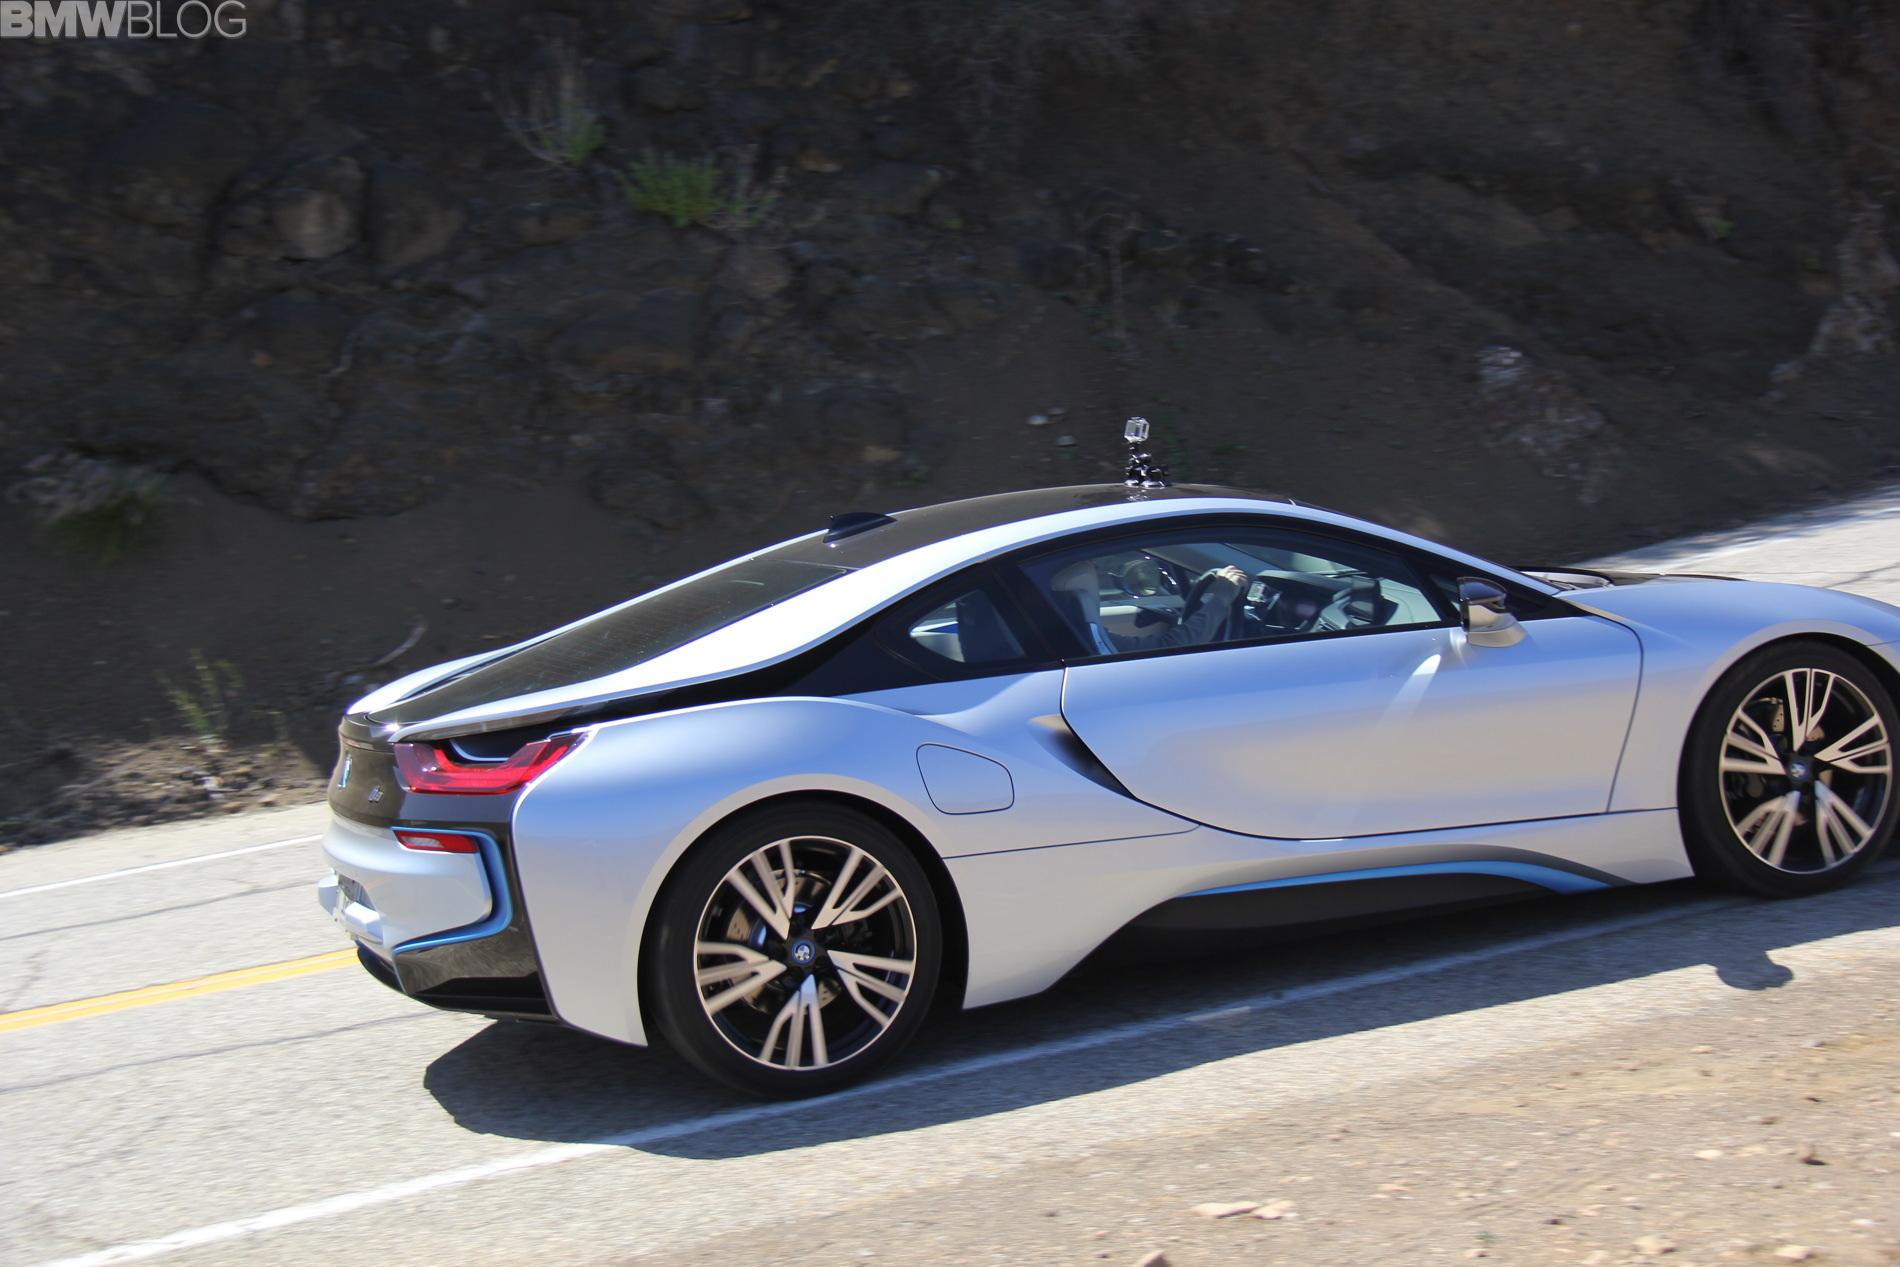 2015 bmw i8 drive review bmwblog 138